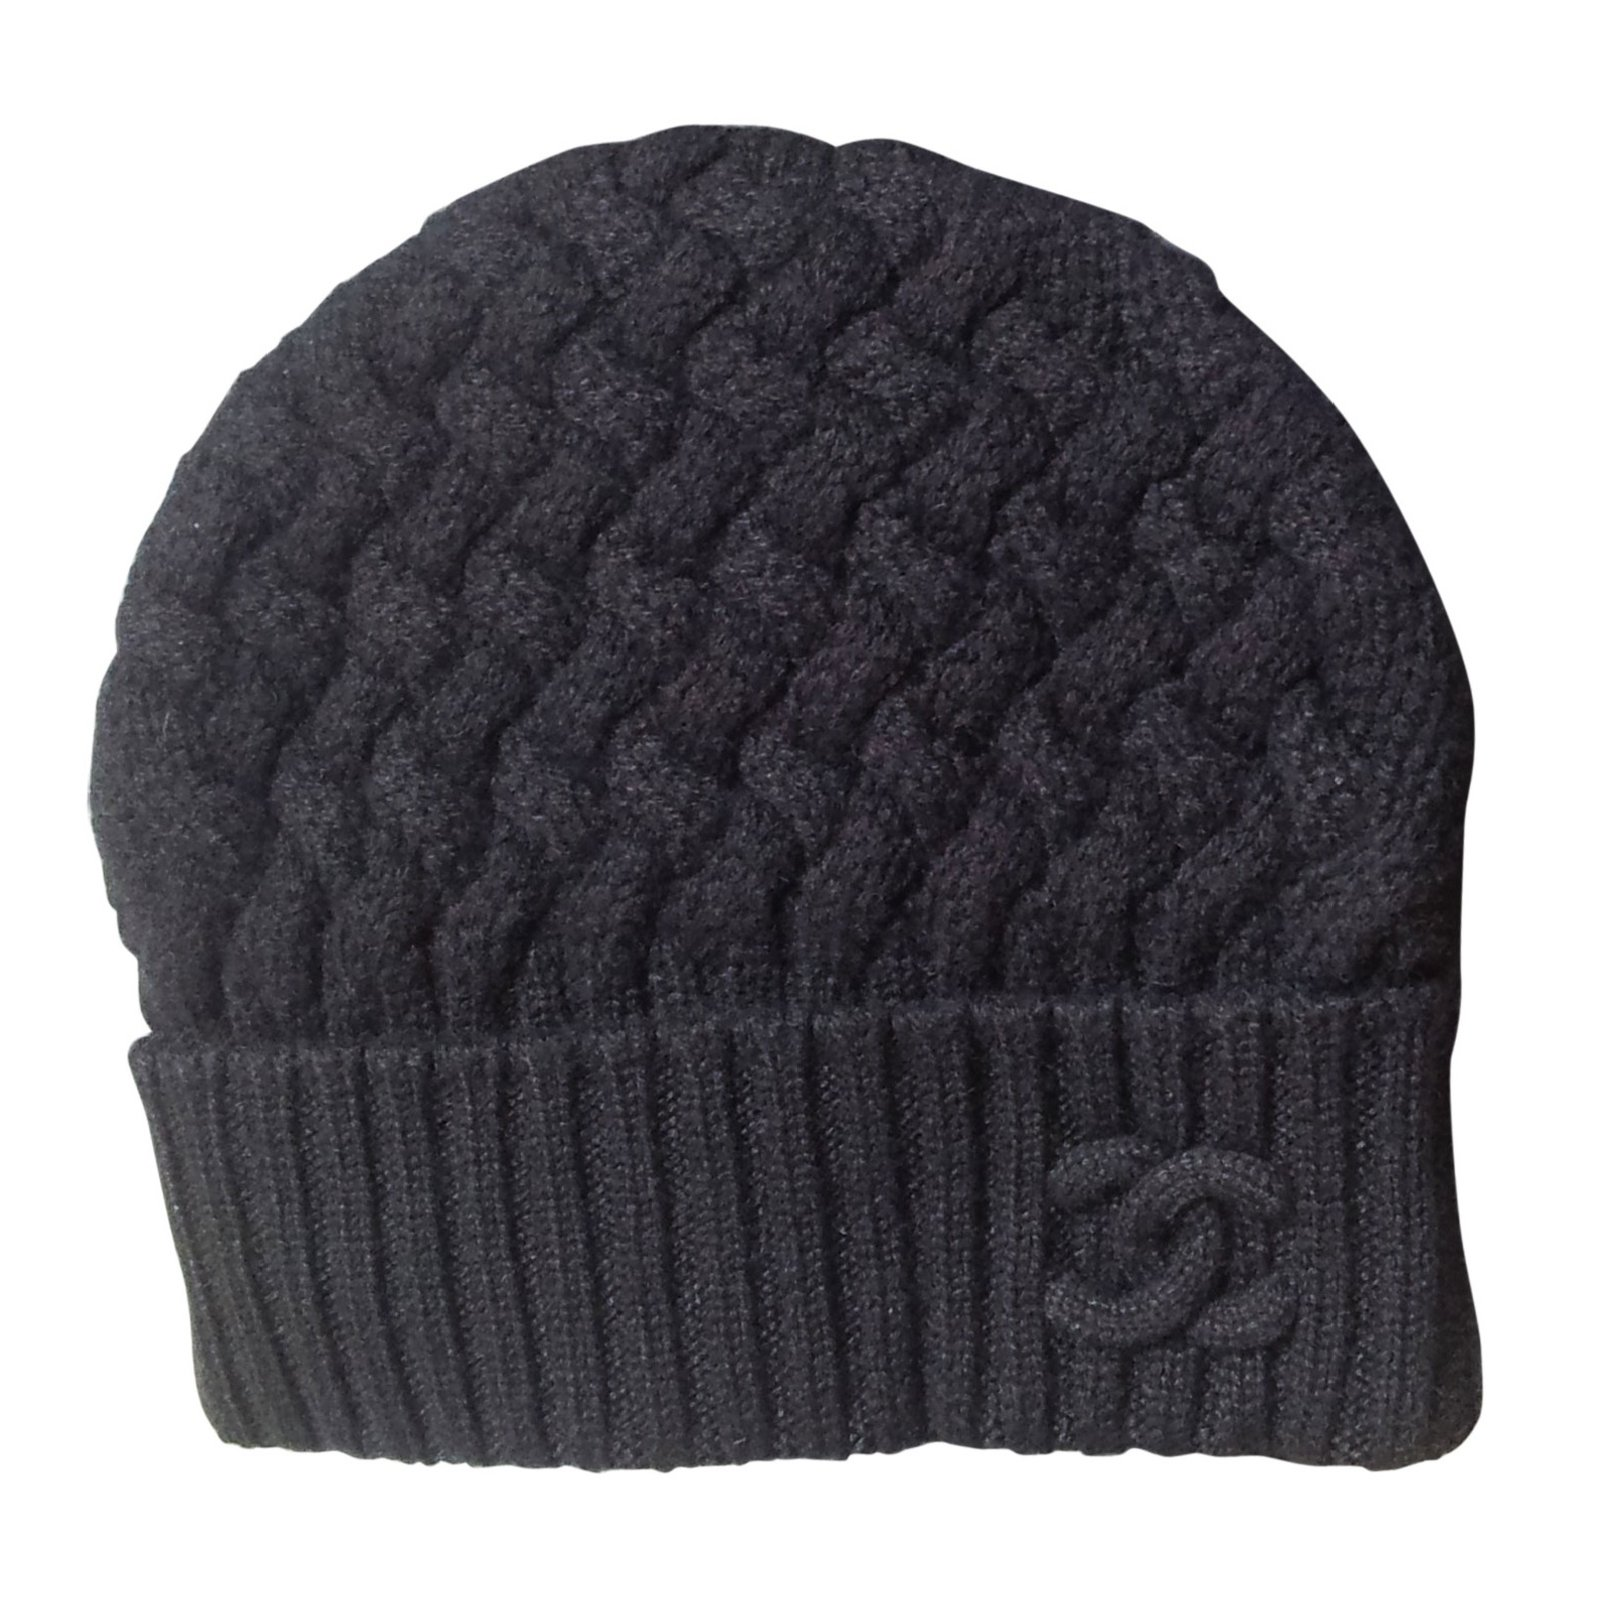 6e7675f9240 Chanel Cashmere beanie Hats Cashmere Black ref.90705 - Joli Closet